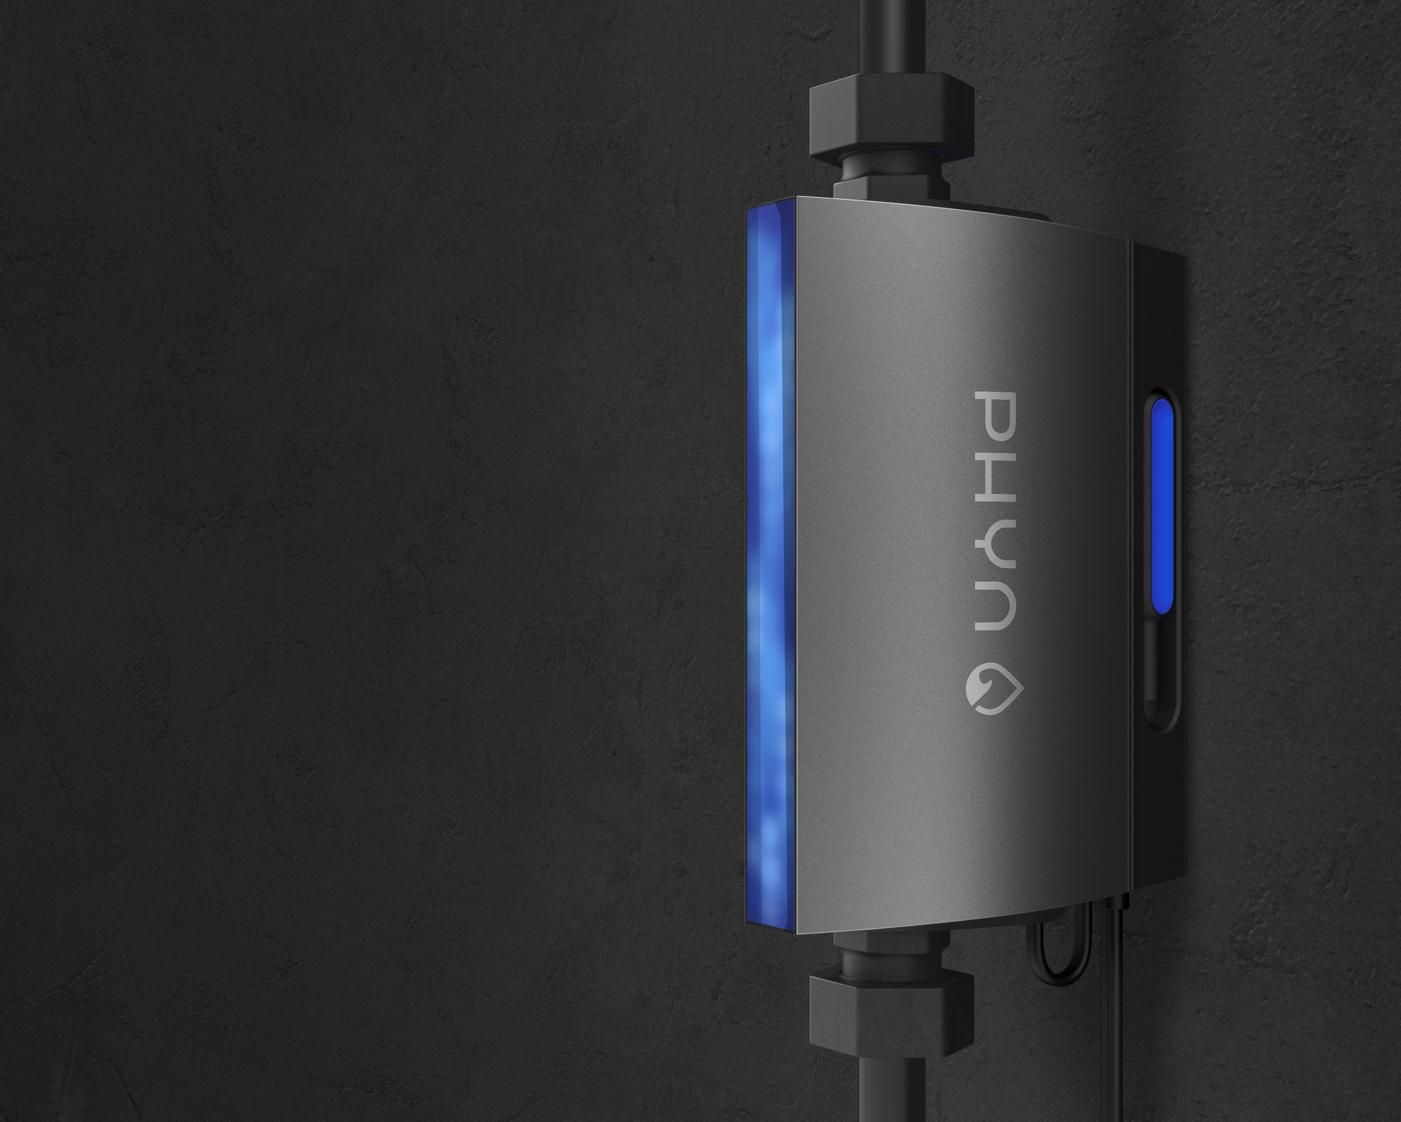 Phyn Plus - Courtoisie : Phyn